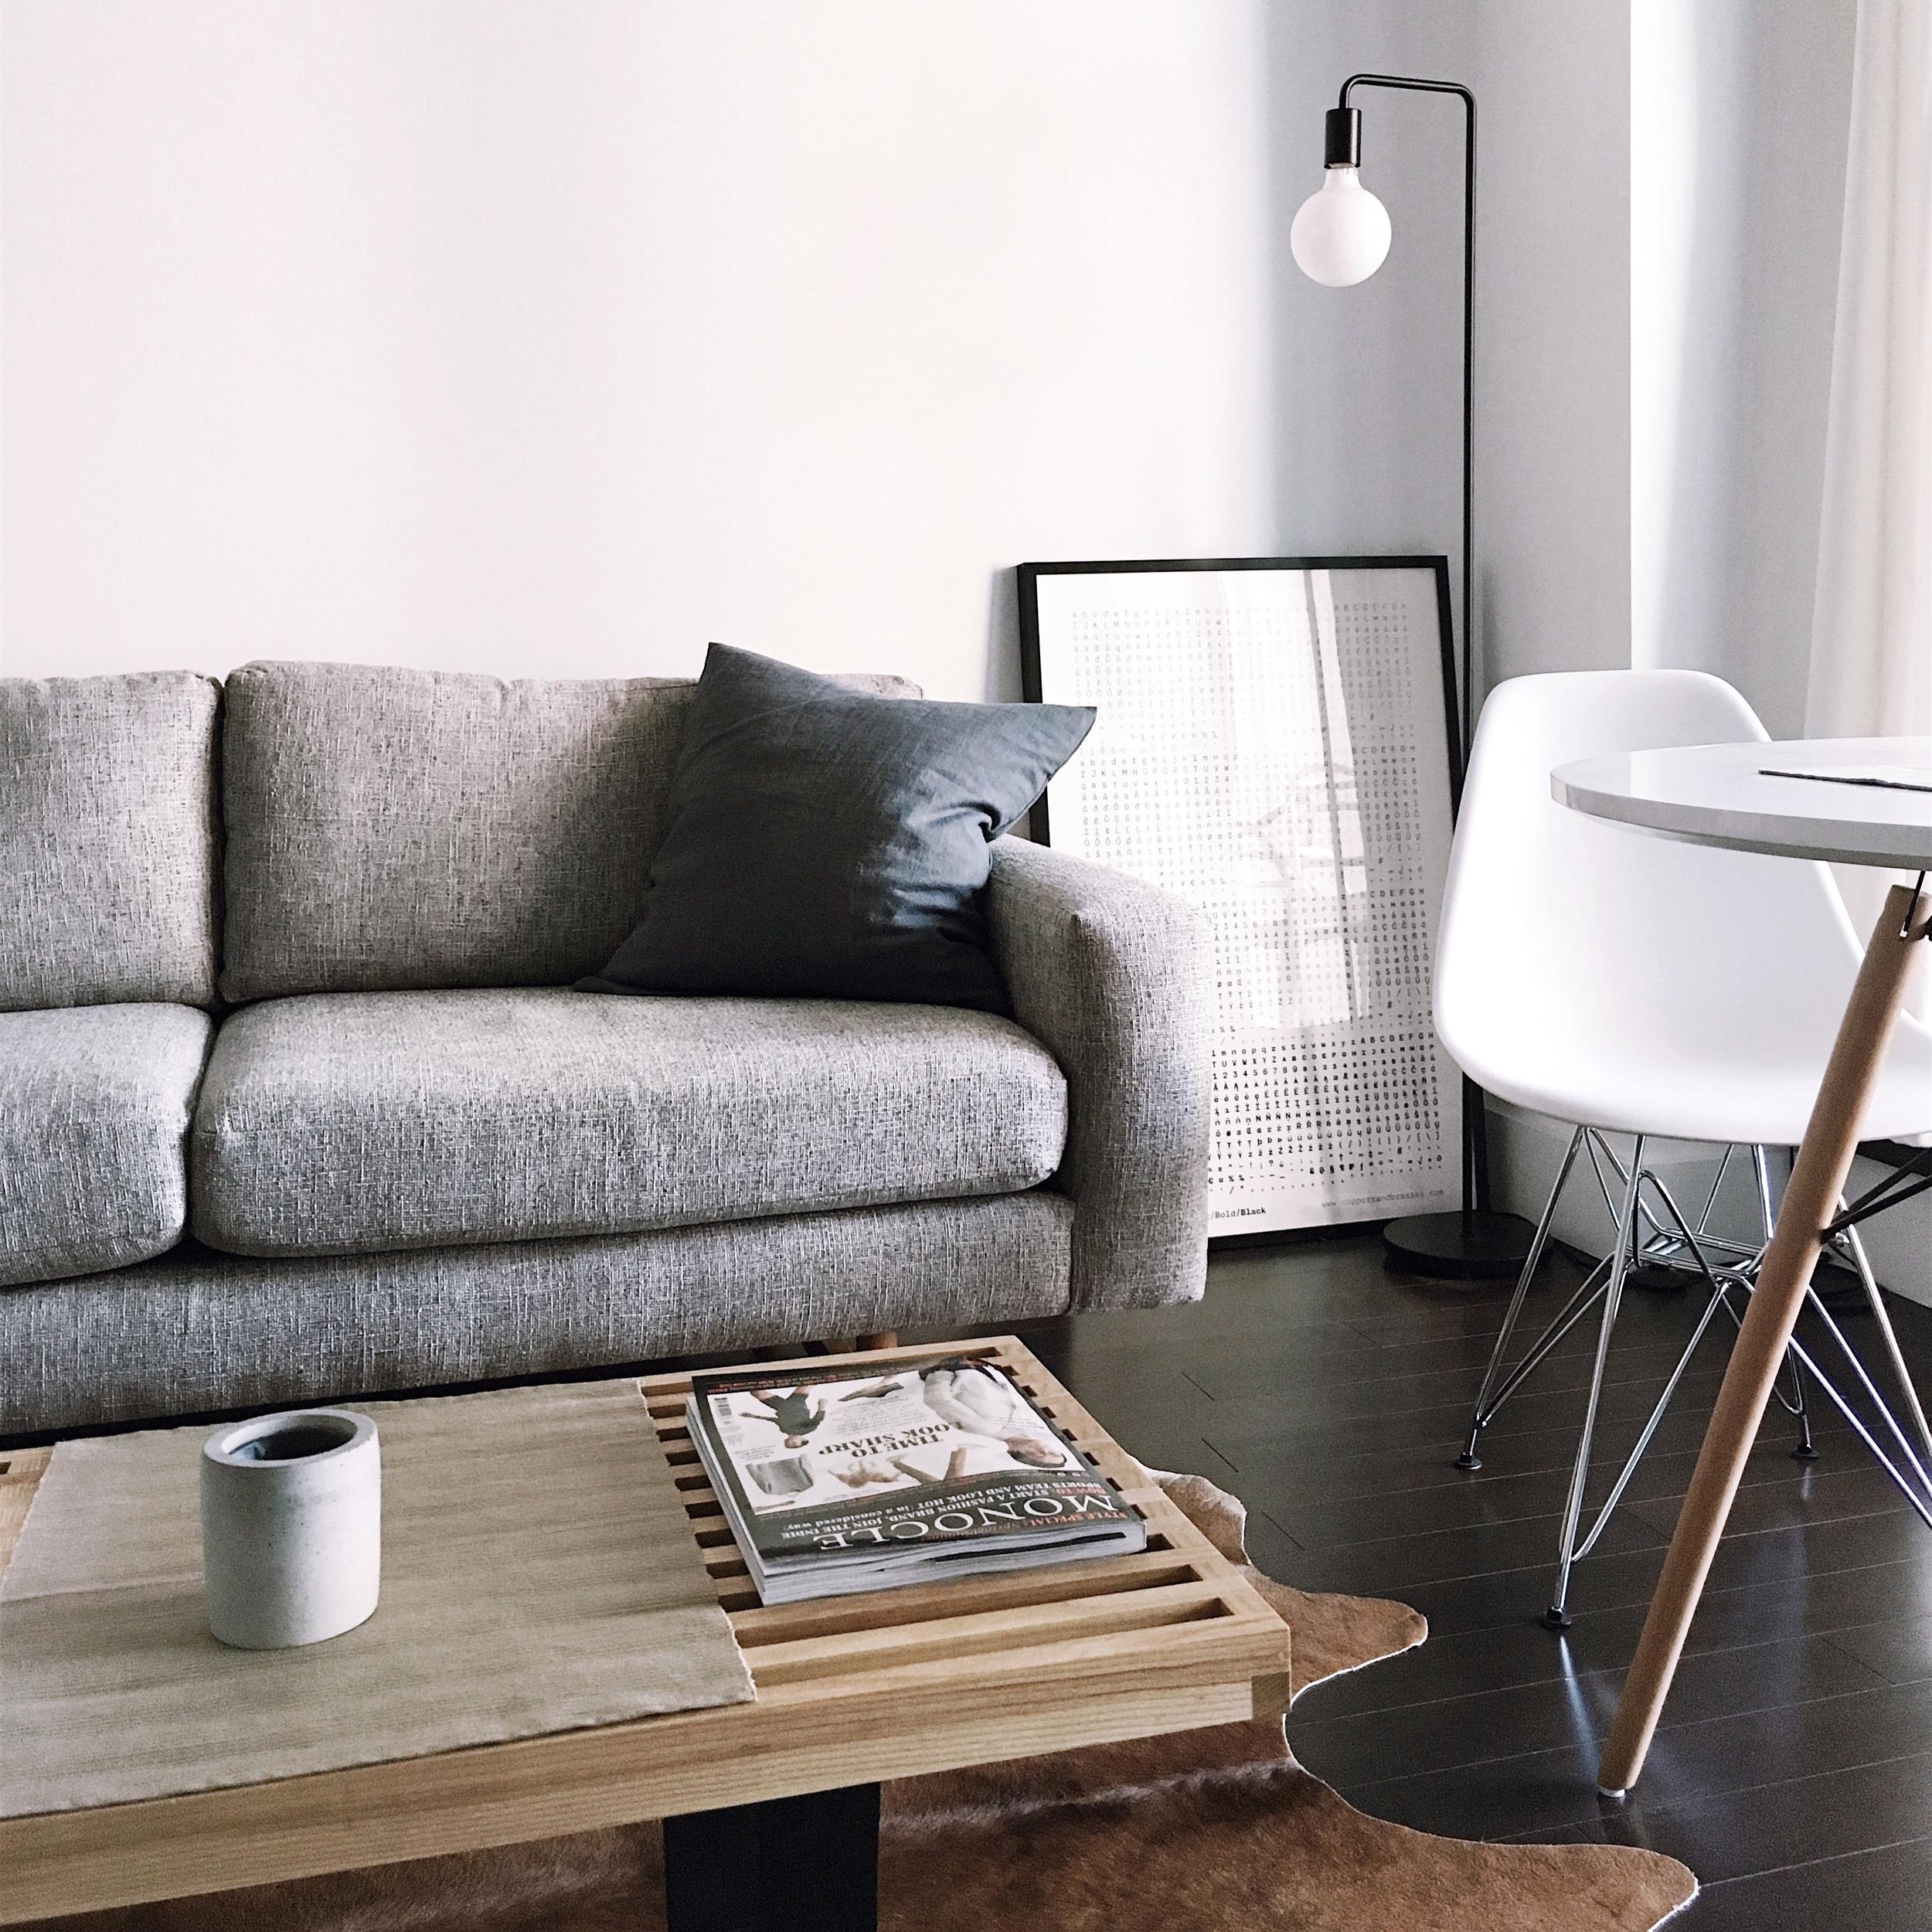 Decent 0.9 - Transforming spaces with our unique designs